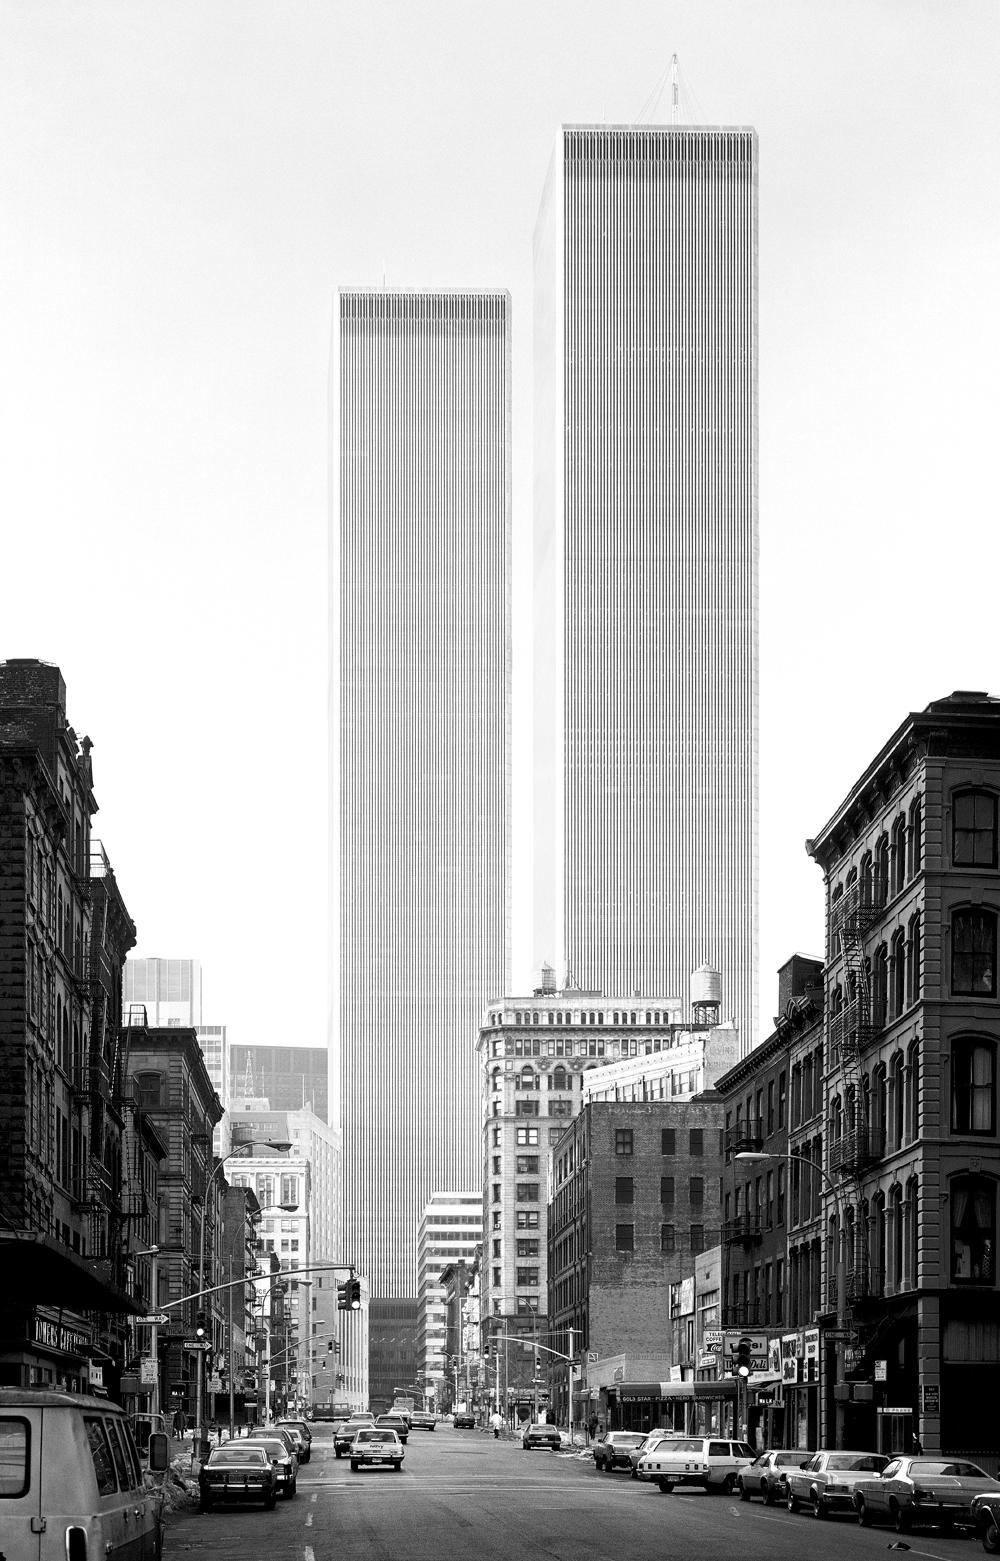 World Trade Towers, Yamasaki, Studio@BalthazarKorab.com